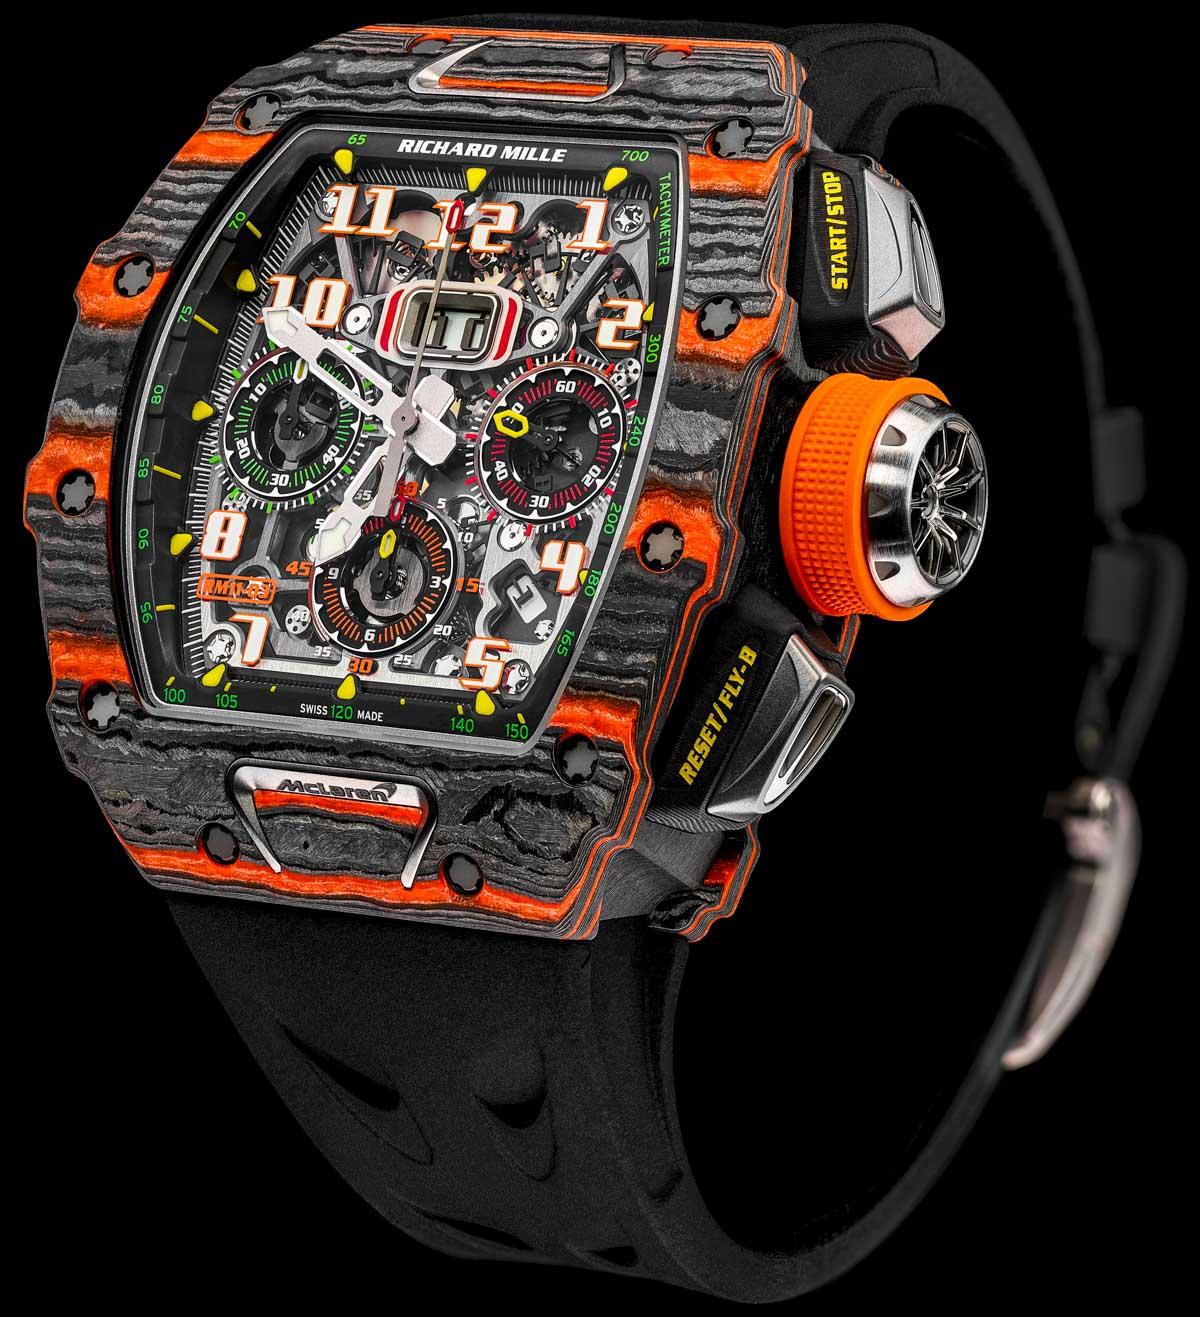 richard-mille-rm-11-03-rm1103-mclaren-automatic-flyback-chronograph-quartztpt-carbontpt-kronograf-karora-svajciora-orasblog-2.jpg